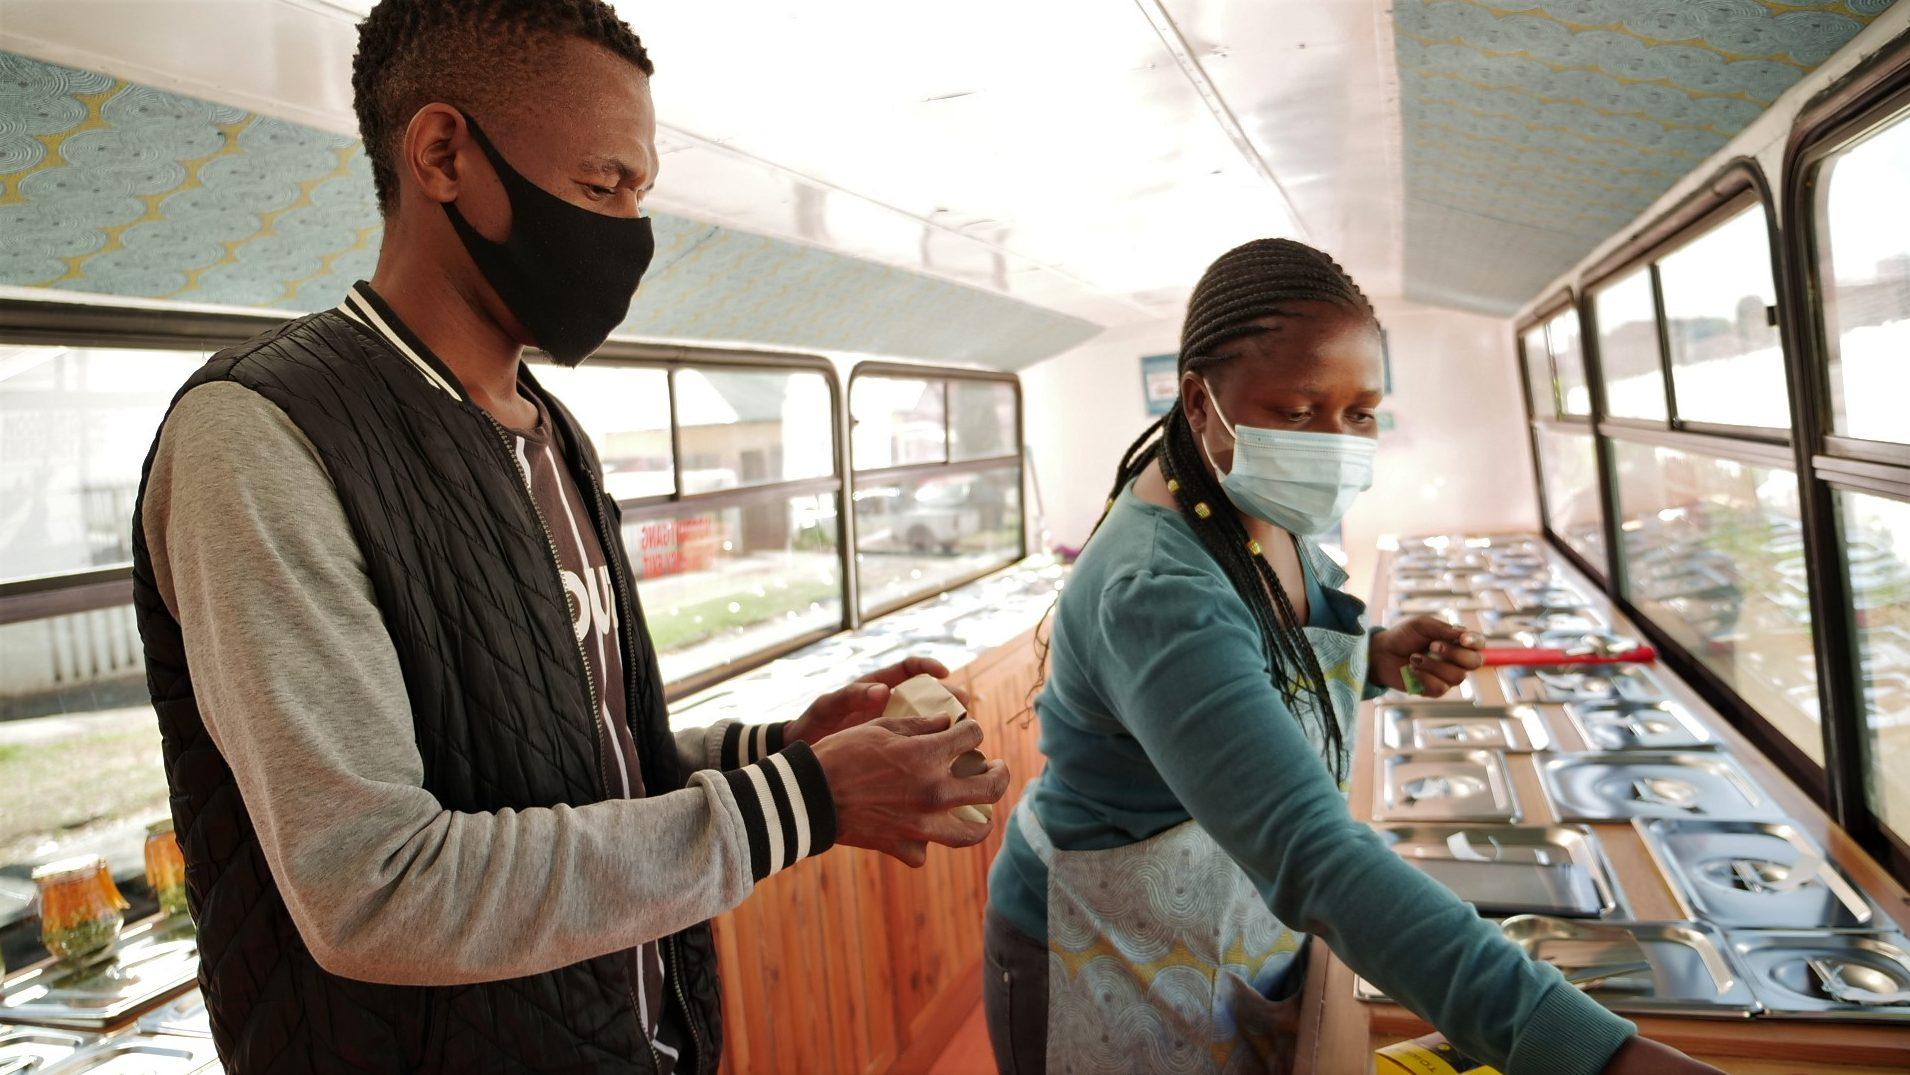 Sanele Msibi assists a customer inside the Skhaftin bus in Johannesburg, South Africa